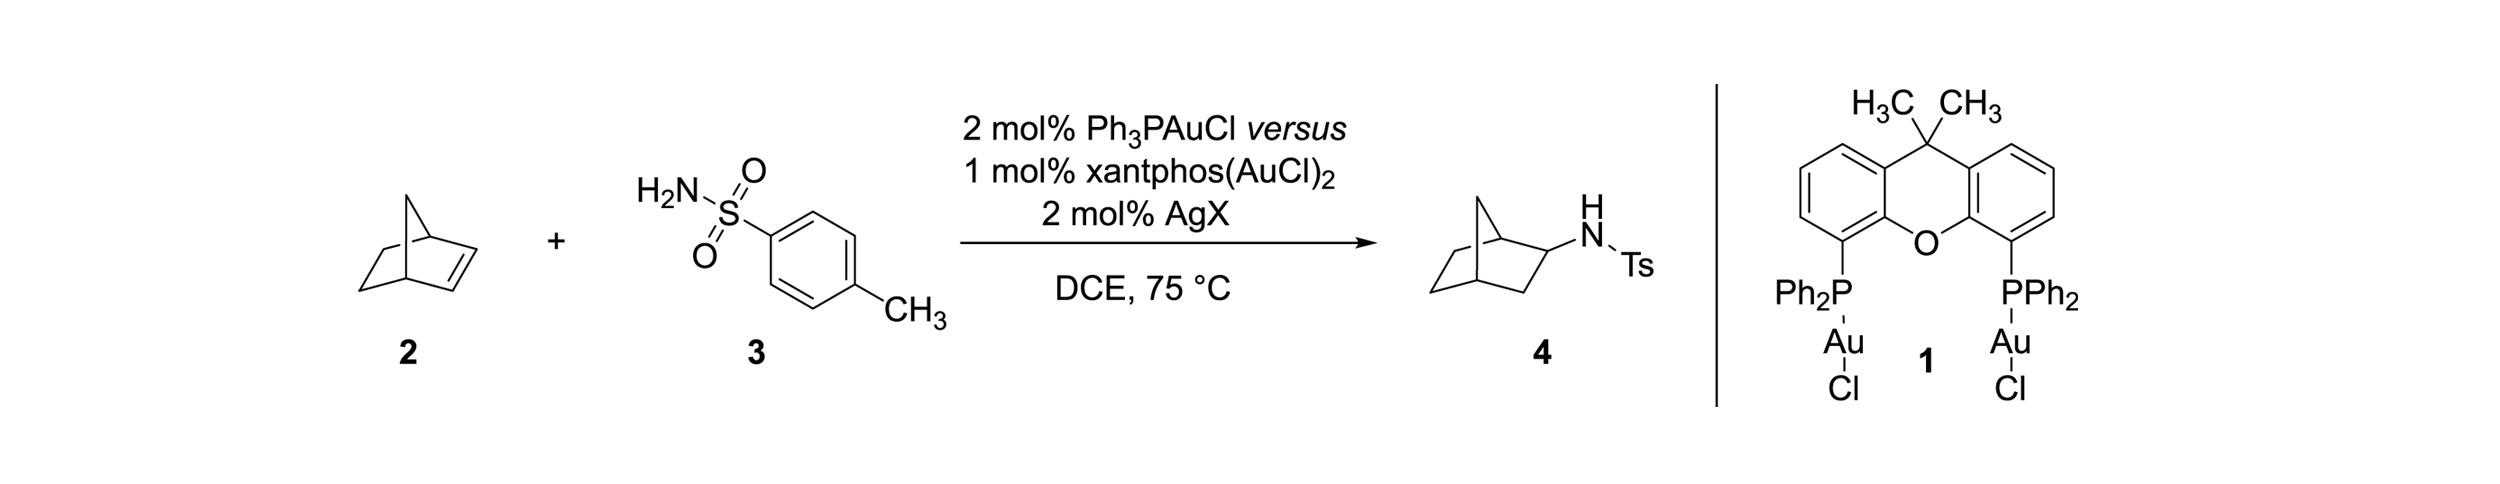 Scheme 1.  Mono- vs. dinuclear gold catalyzed intermolecular hydroamidation of norbornene.[1]